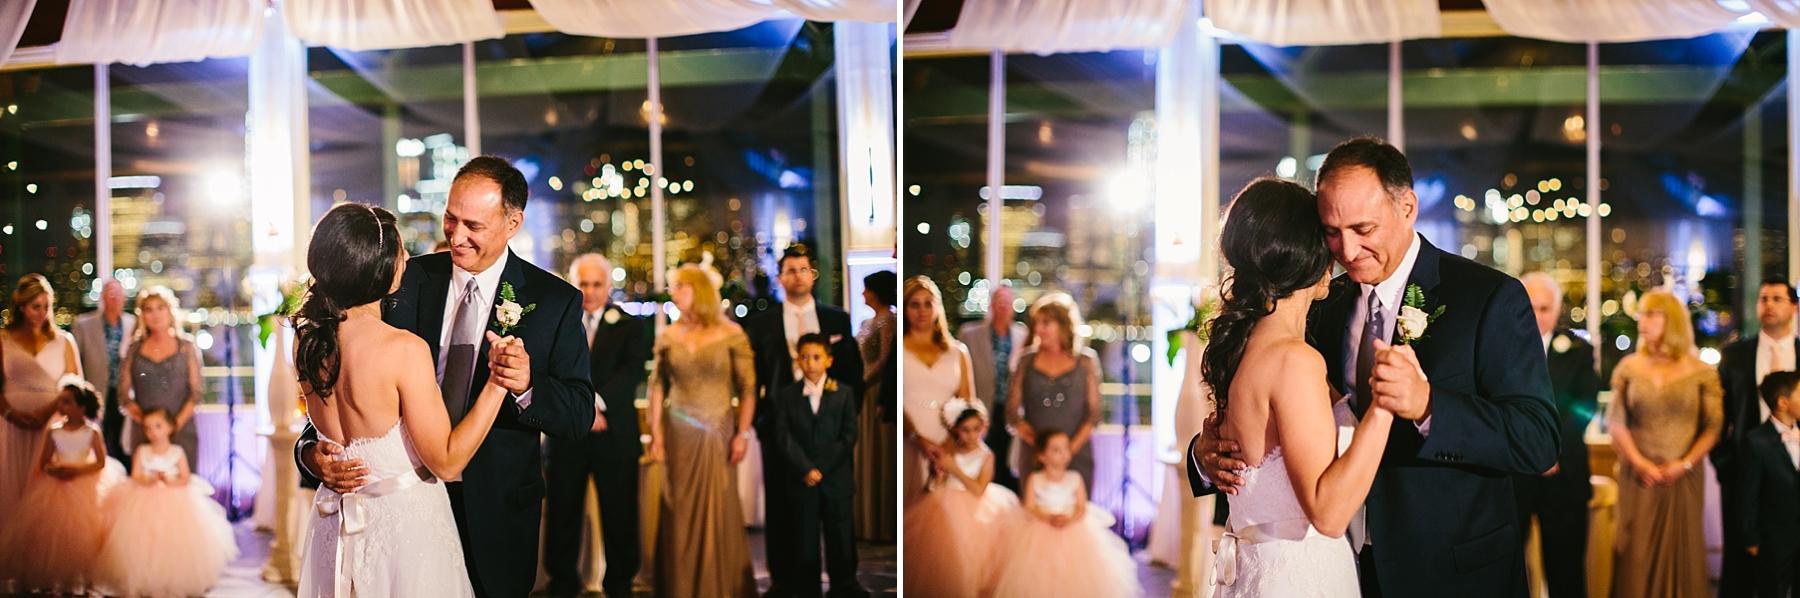 liberty-state-park-wedding-photographer-ny-nj_0046.jpg